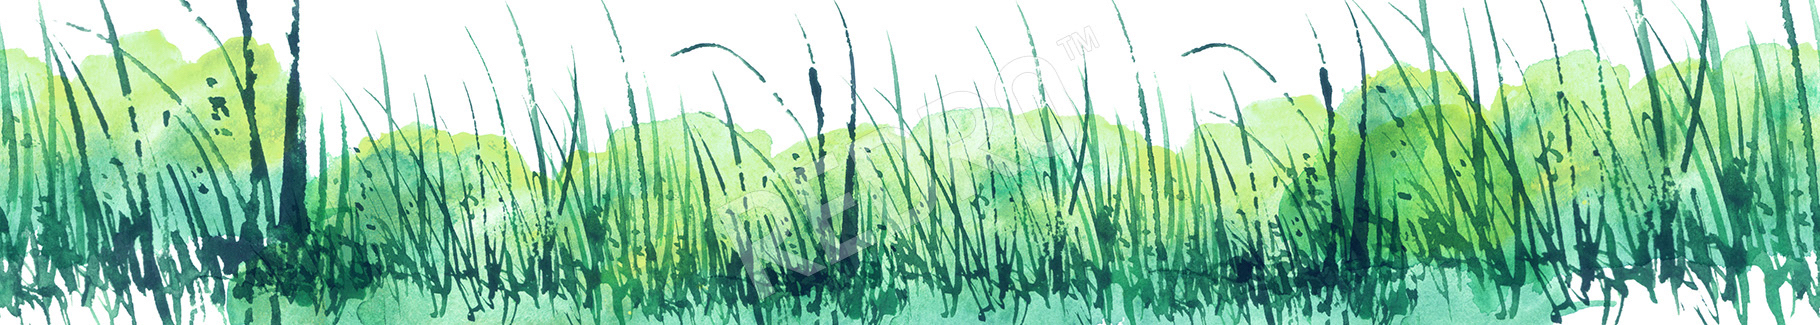 Naklejka trawa akwarela